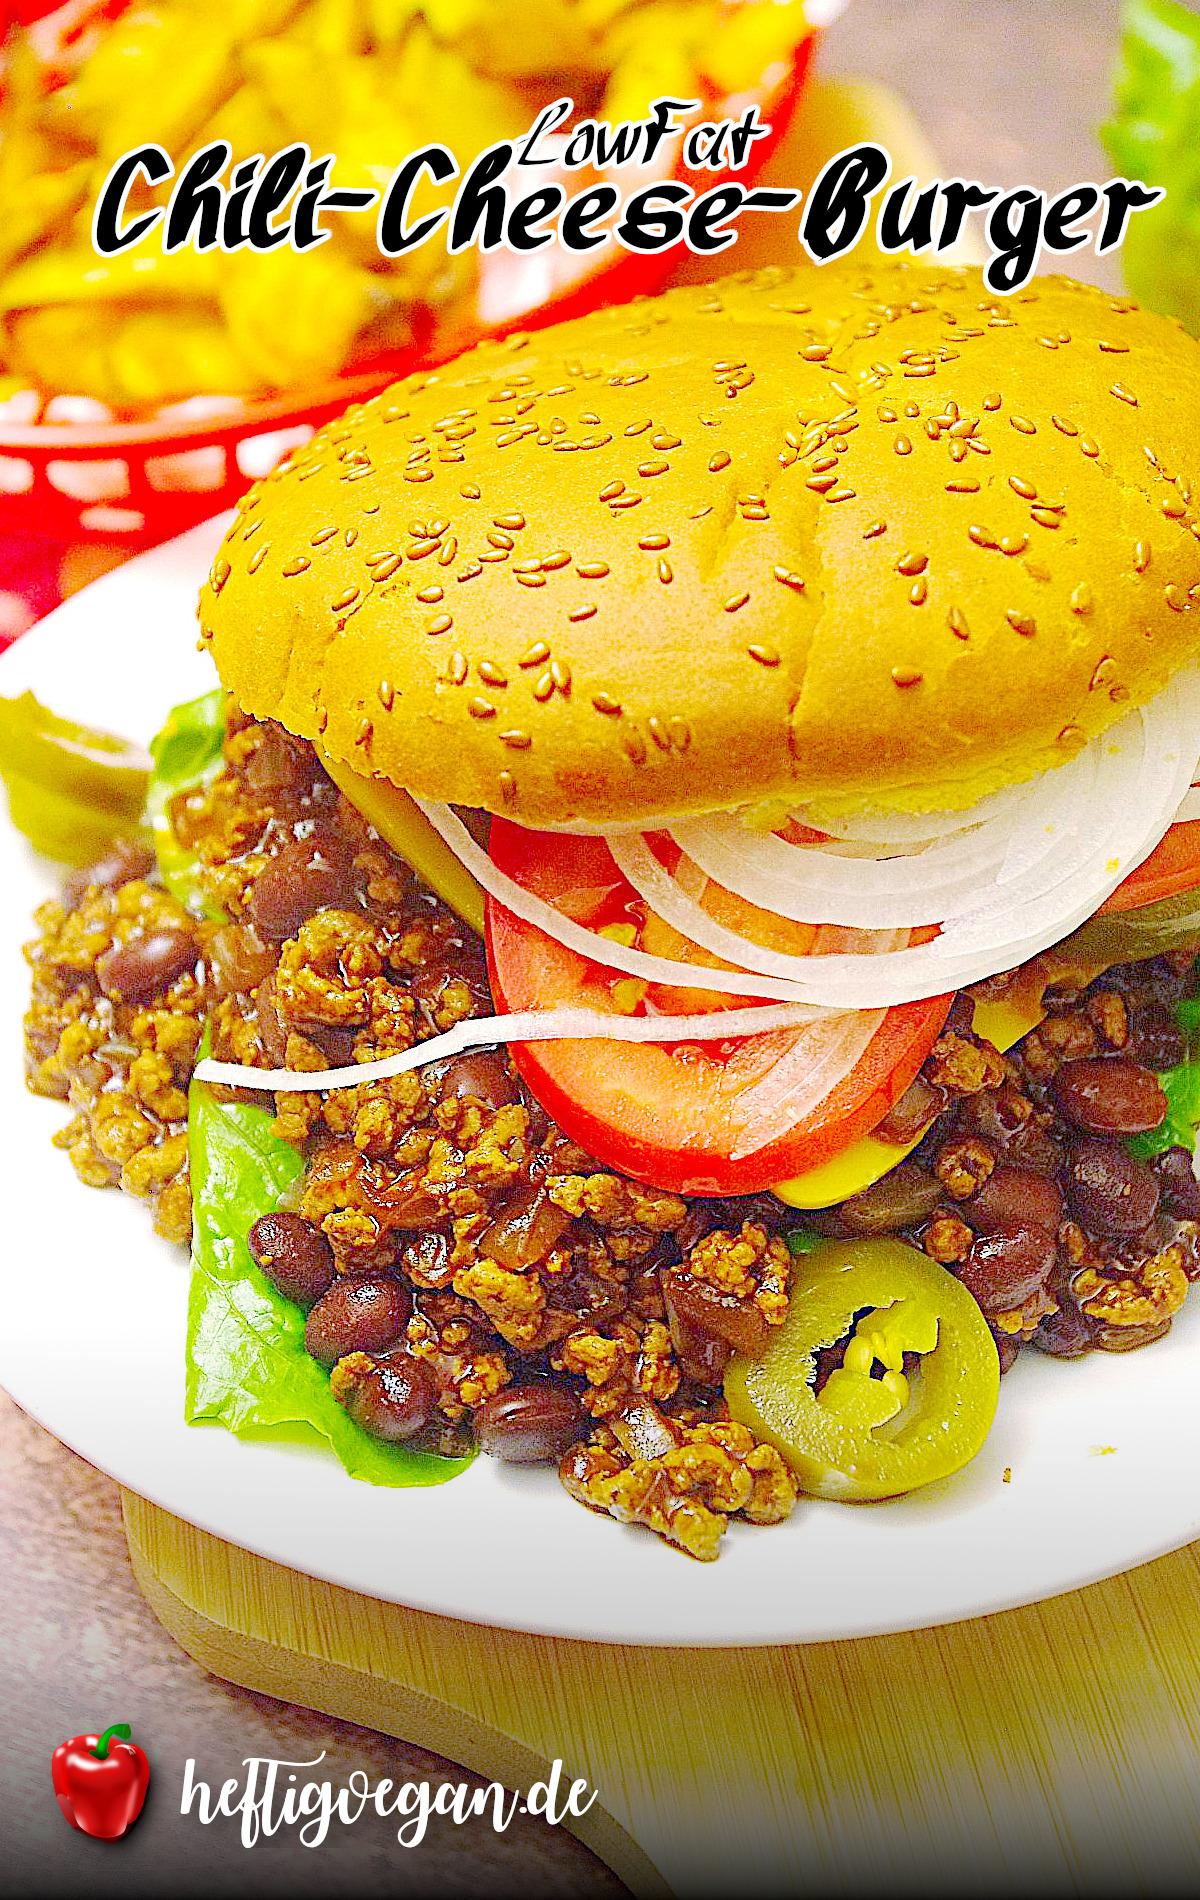 Chili-Cheese-Burger, Vegan, LowFat auf Pinterest